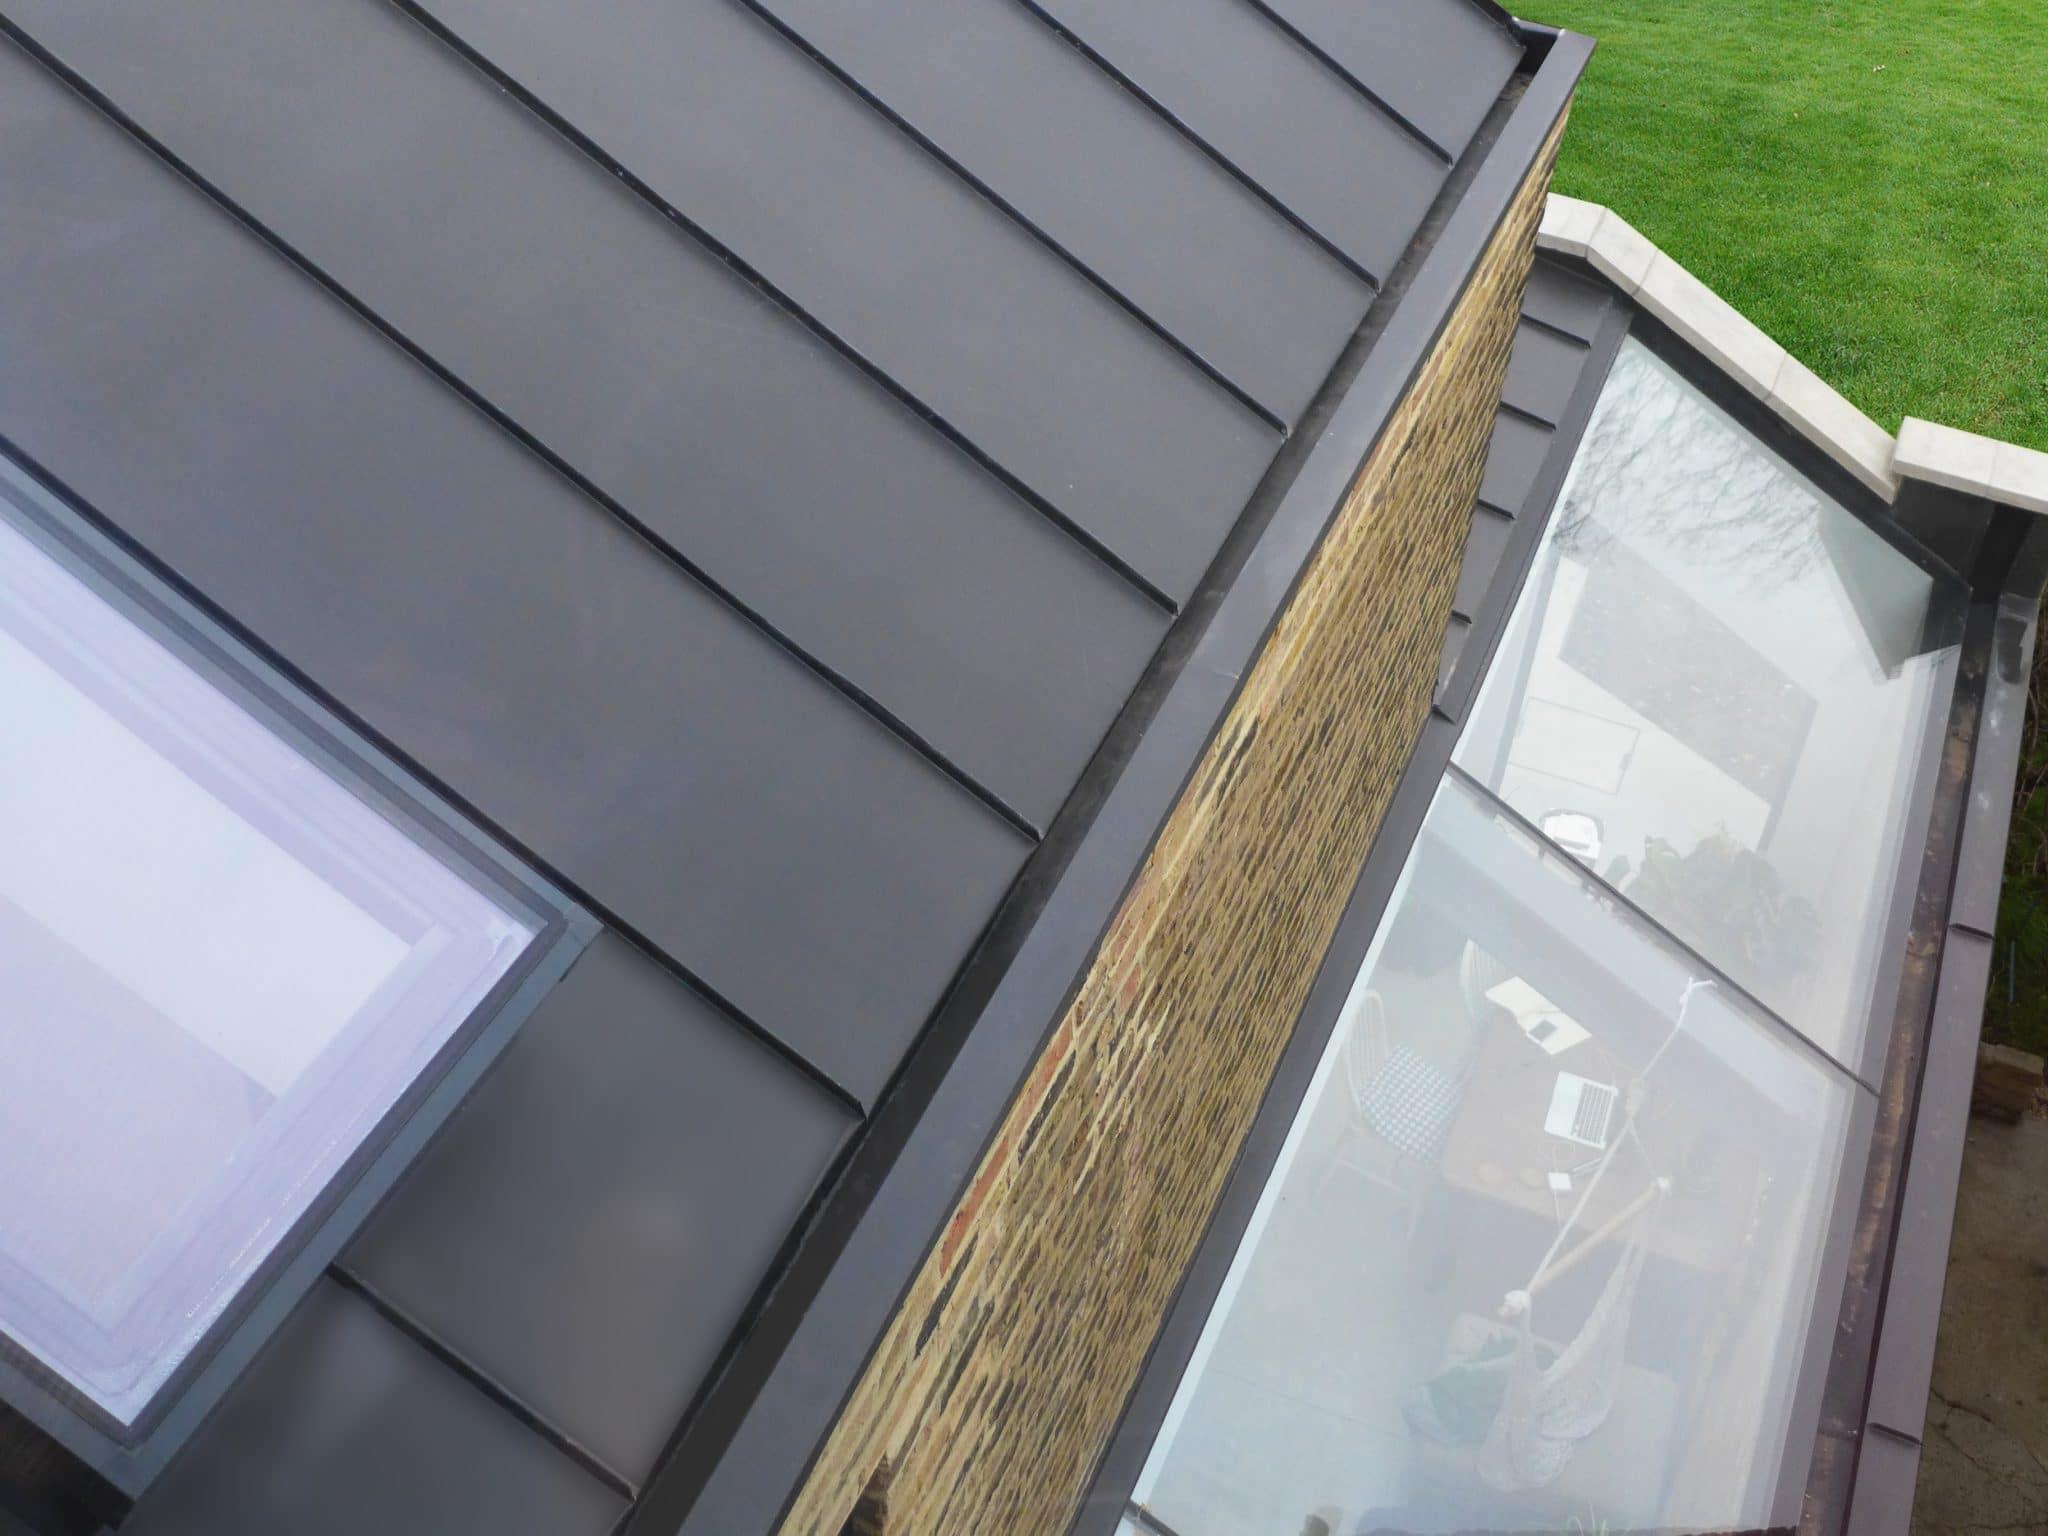 Zinc Roof standing seam cladding and frameless skylight